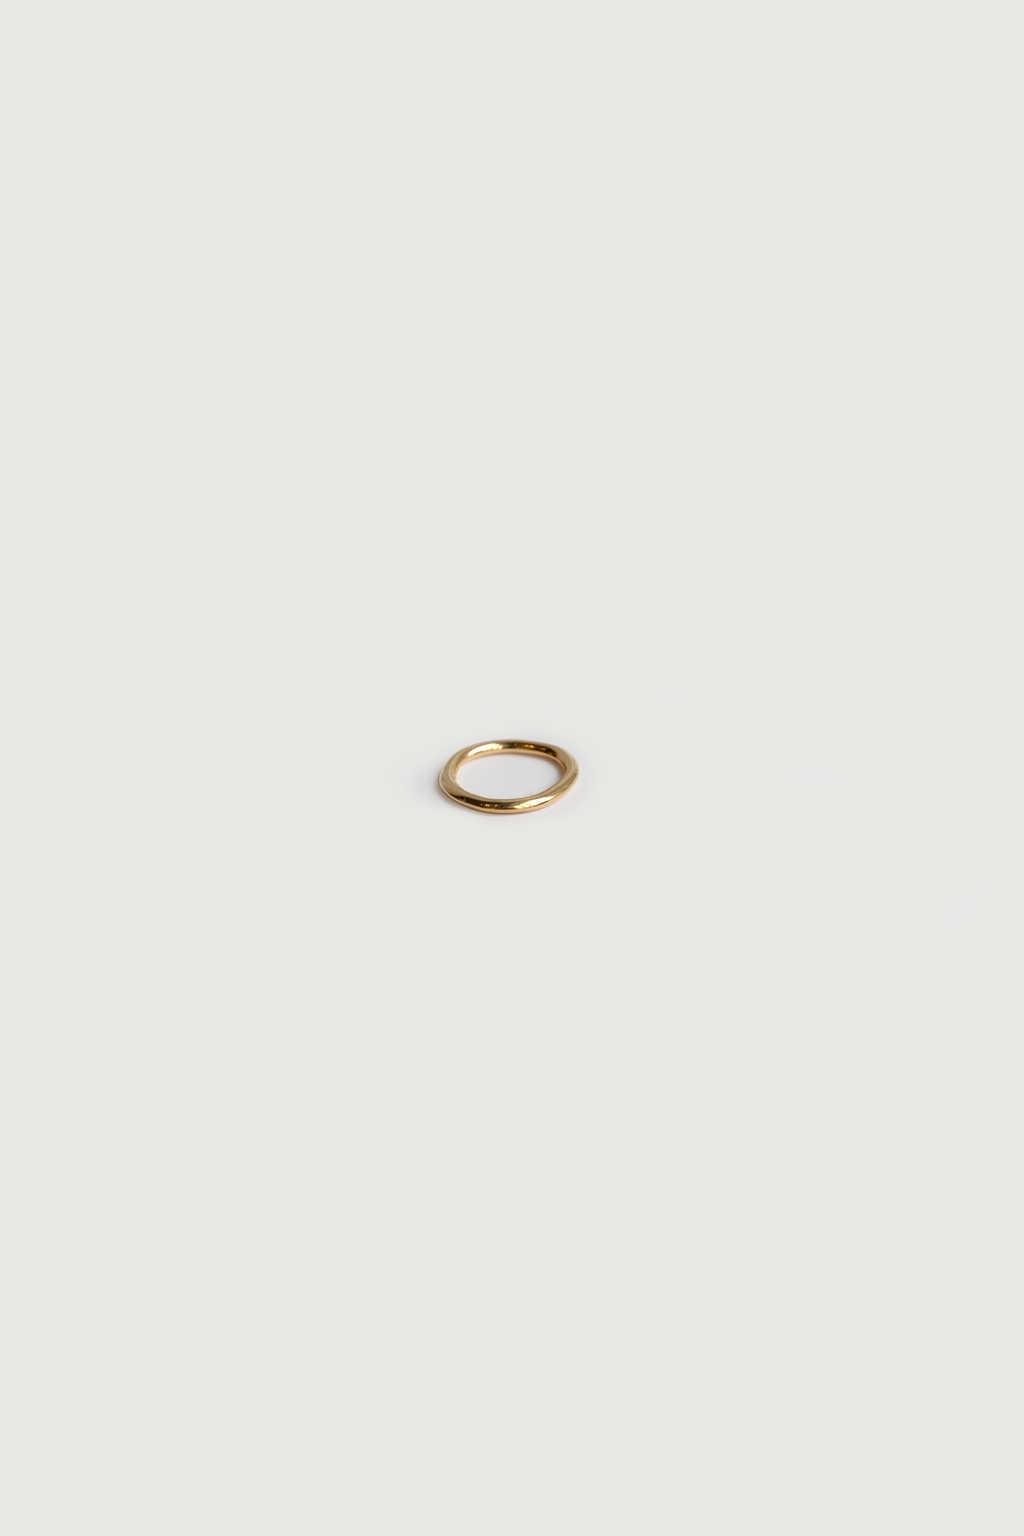 Ring K003 Gold 2